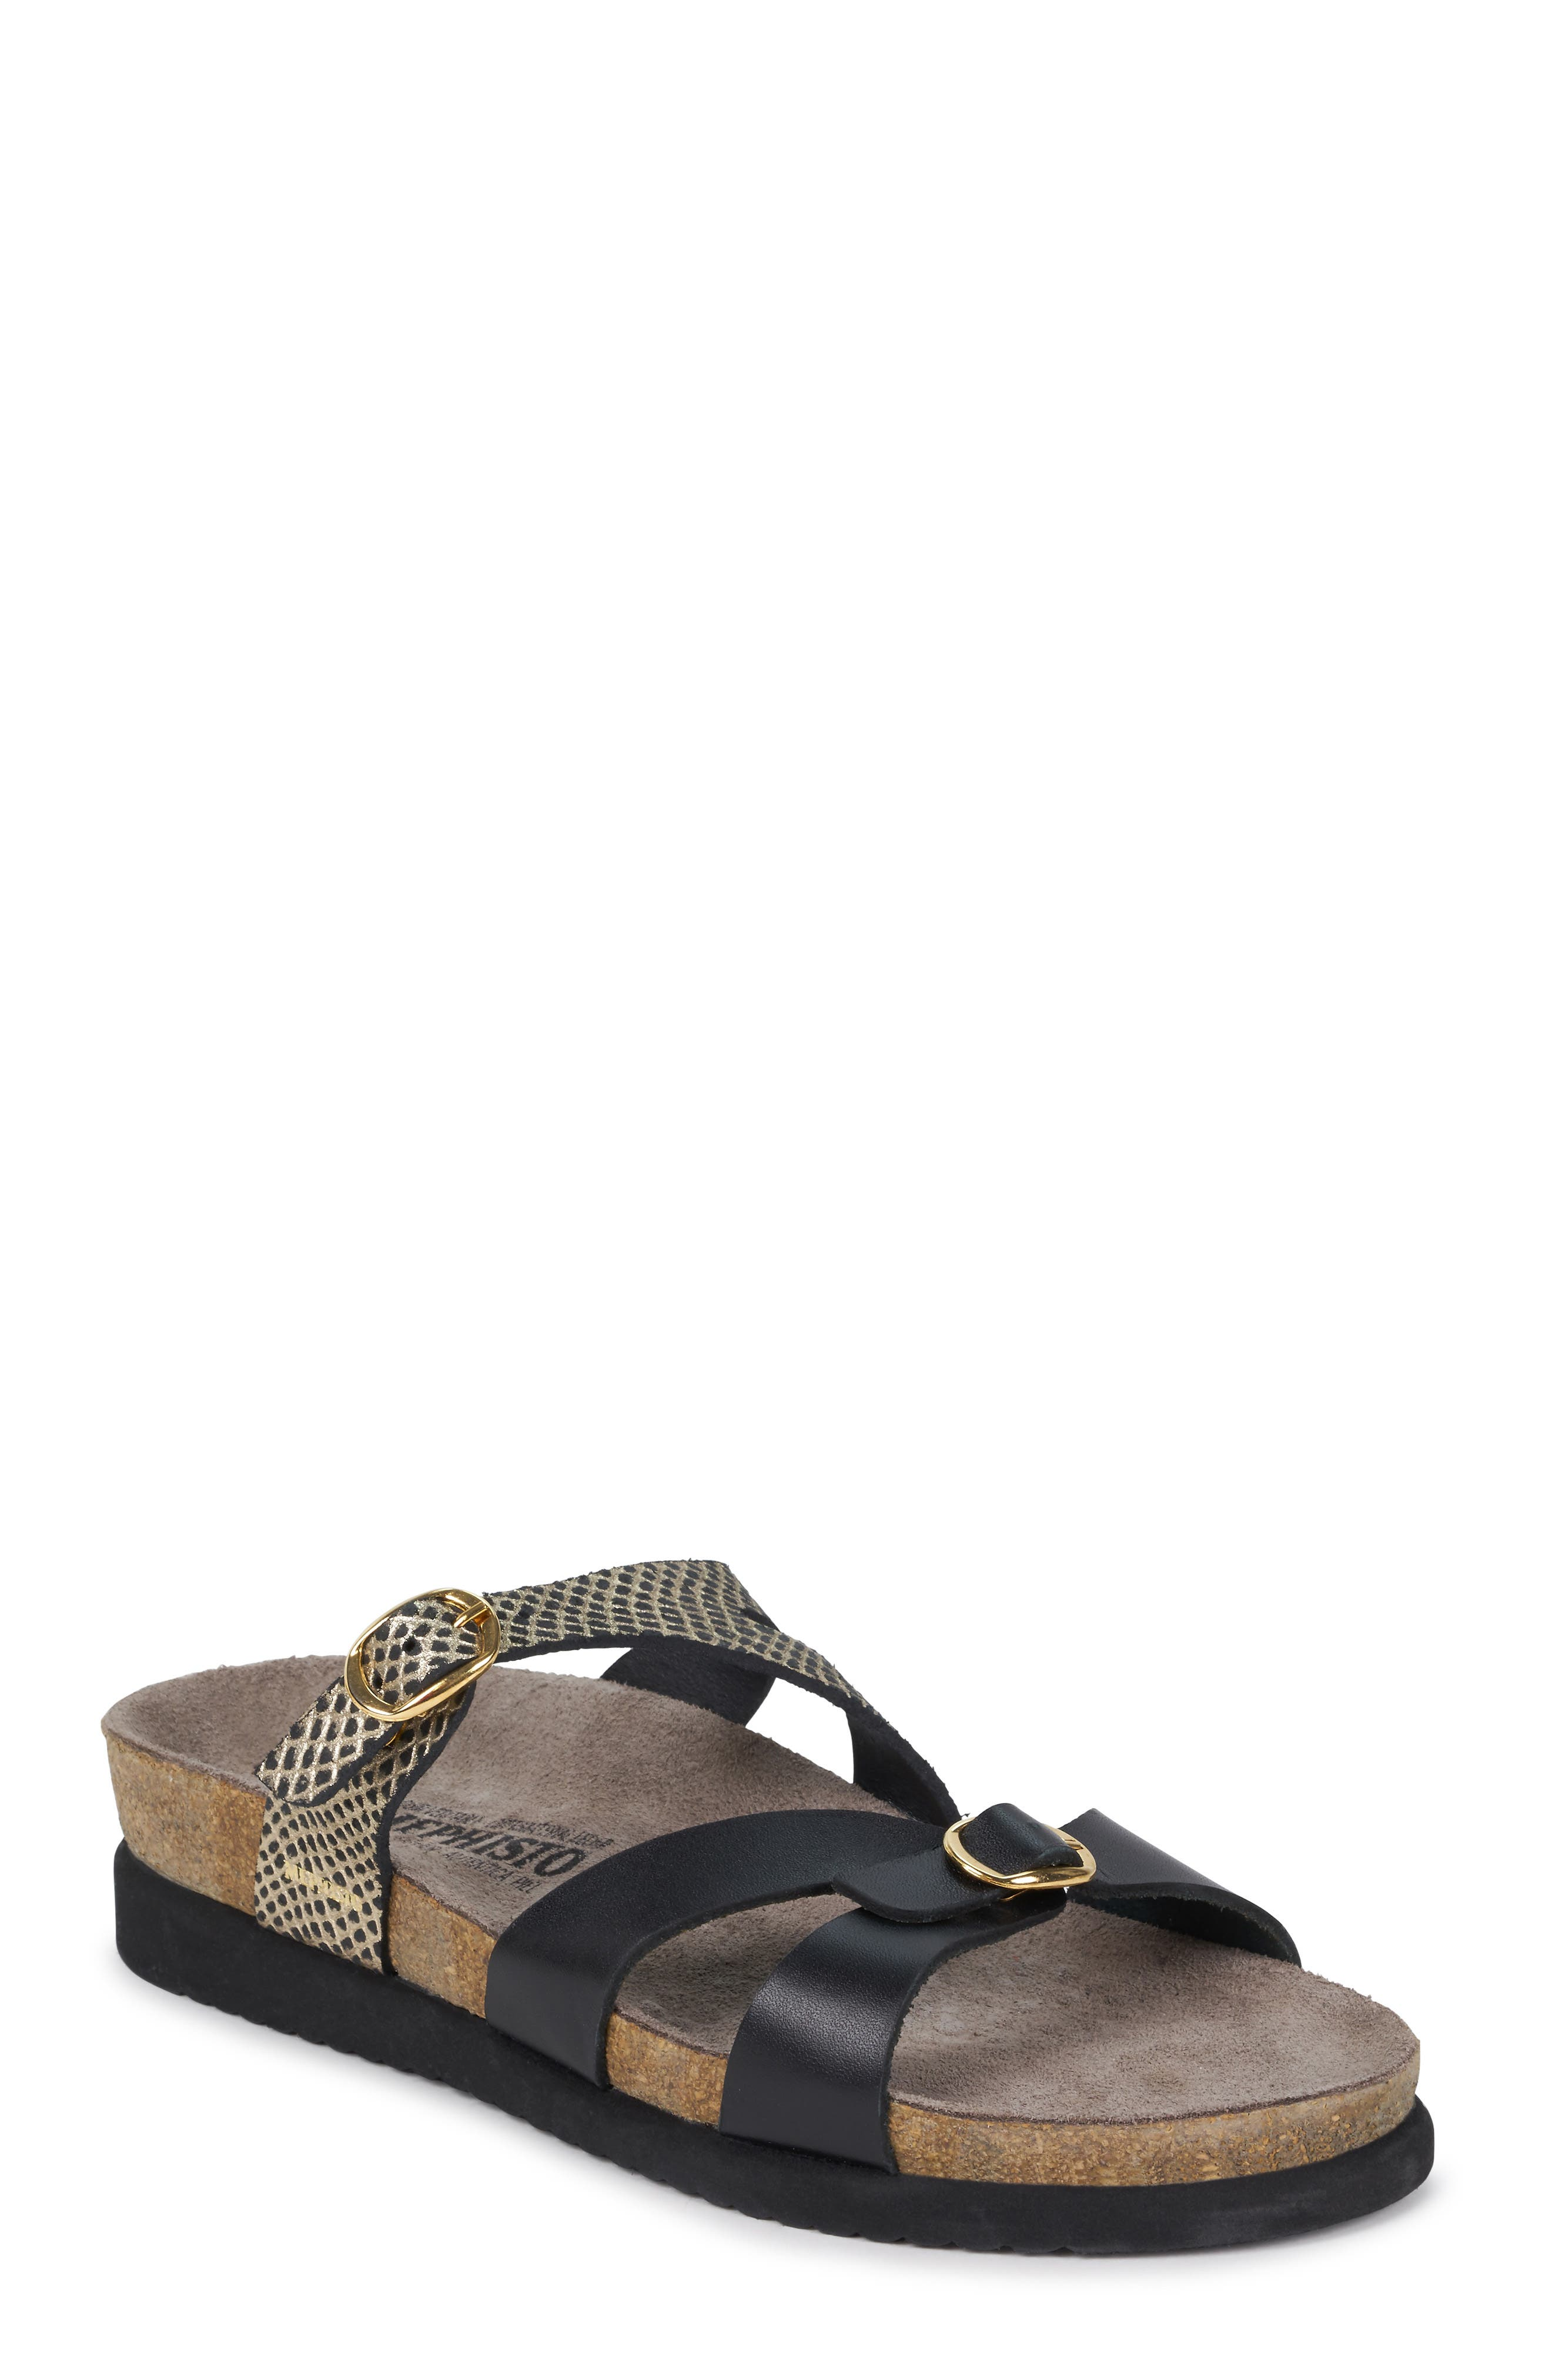 'Hannel' Sandal, Main, color, BLACK CUBA WAXY LEATHER